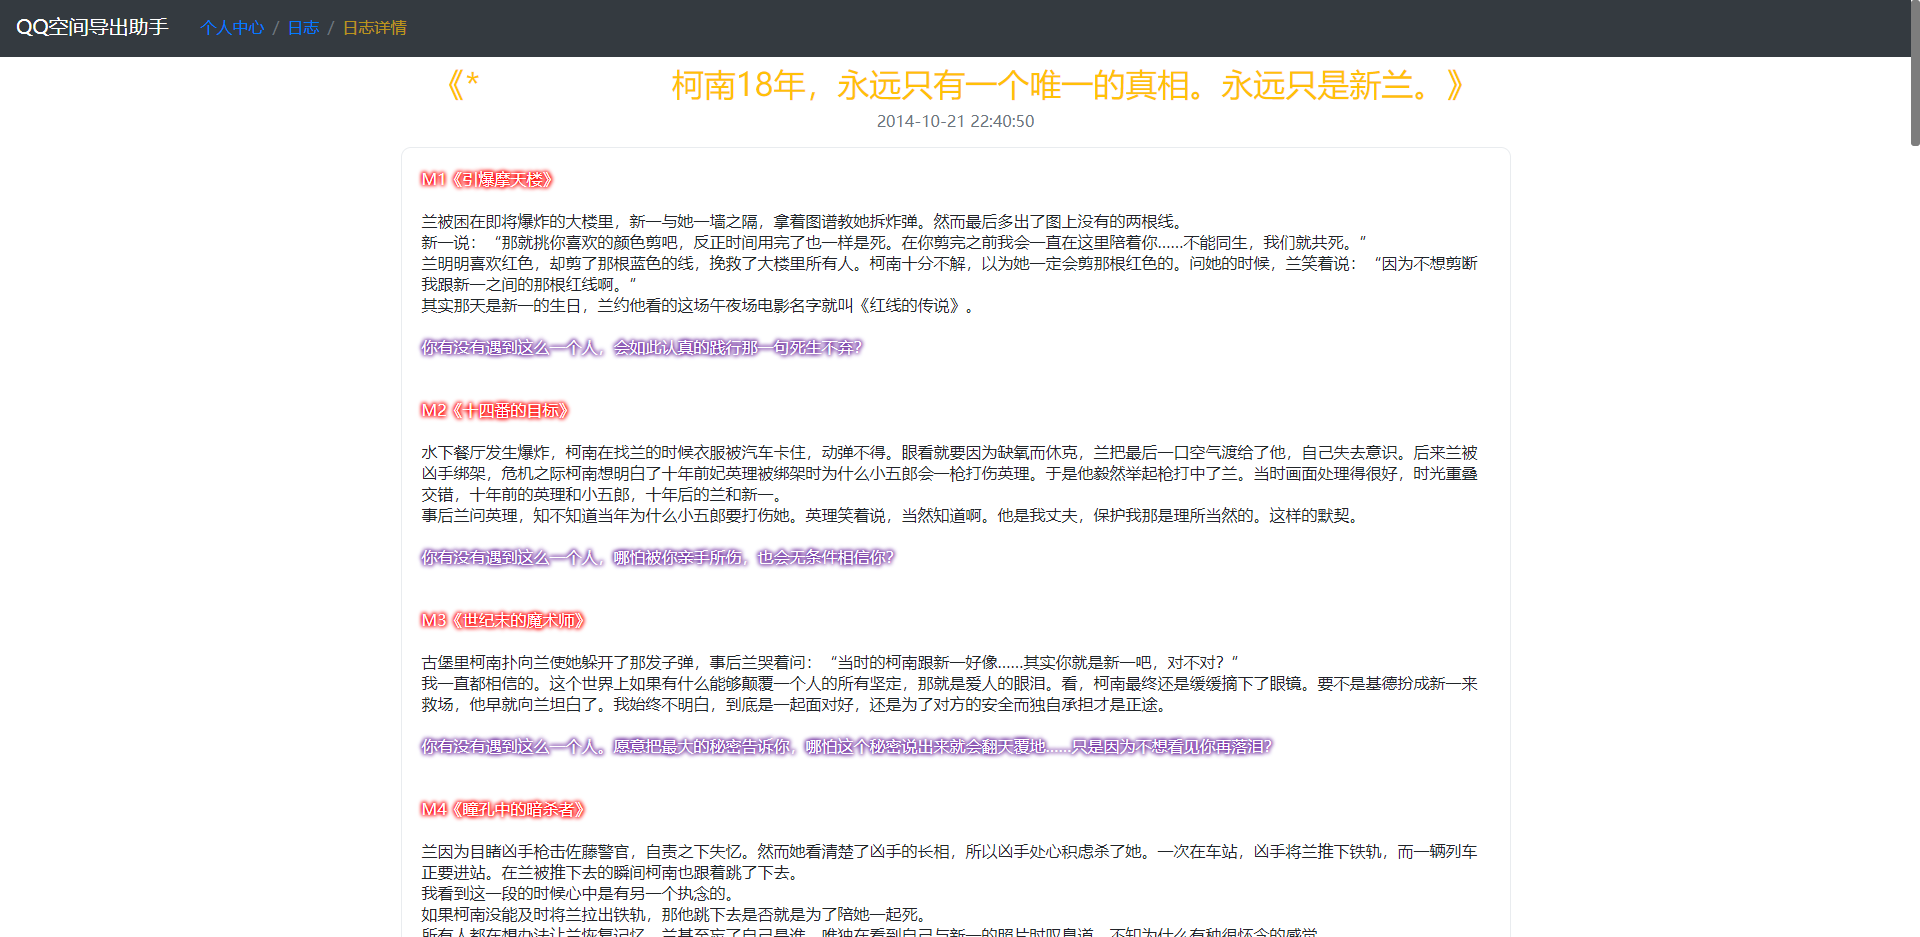 QQ空间数据导出浏览器插件